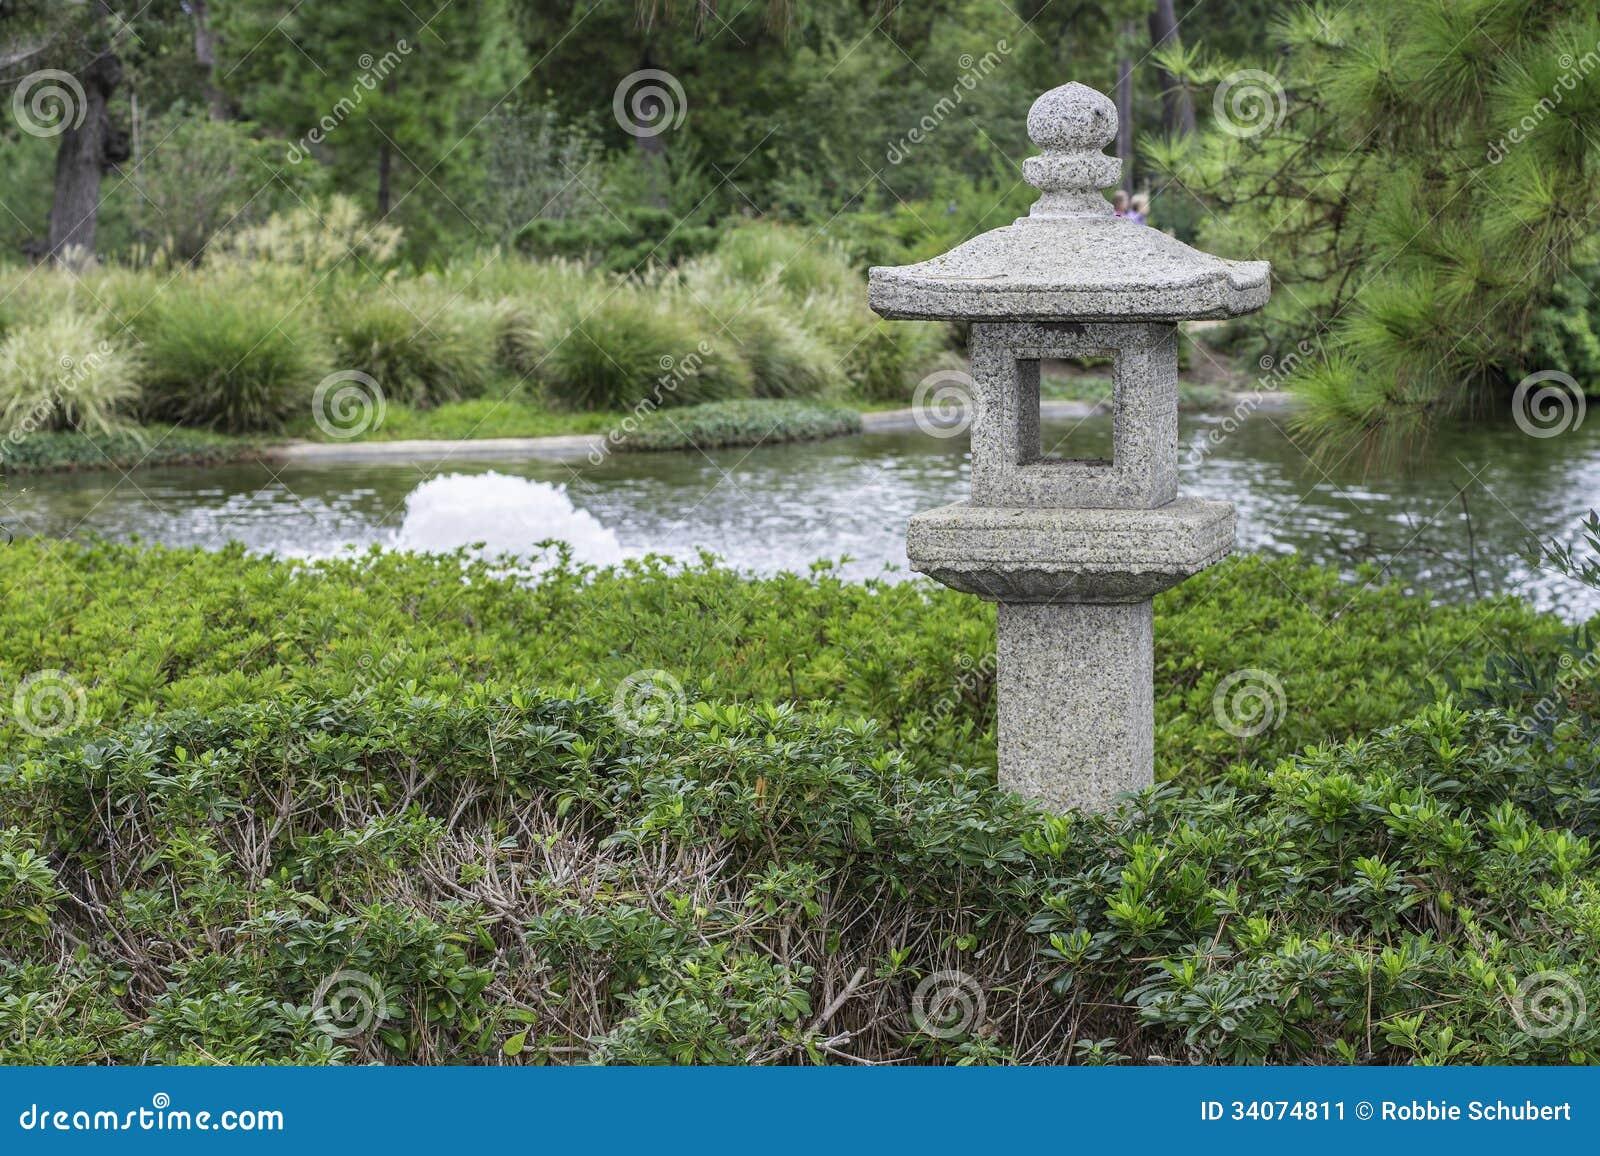 orientalische garten pagoden statue stockbild bild 34074811. Black Bedroom Furniture Sets. Home Design Ideas